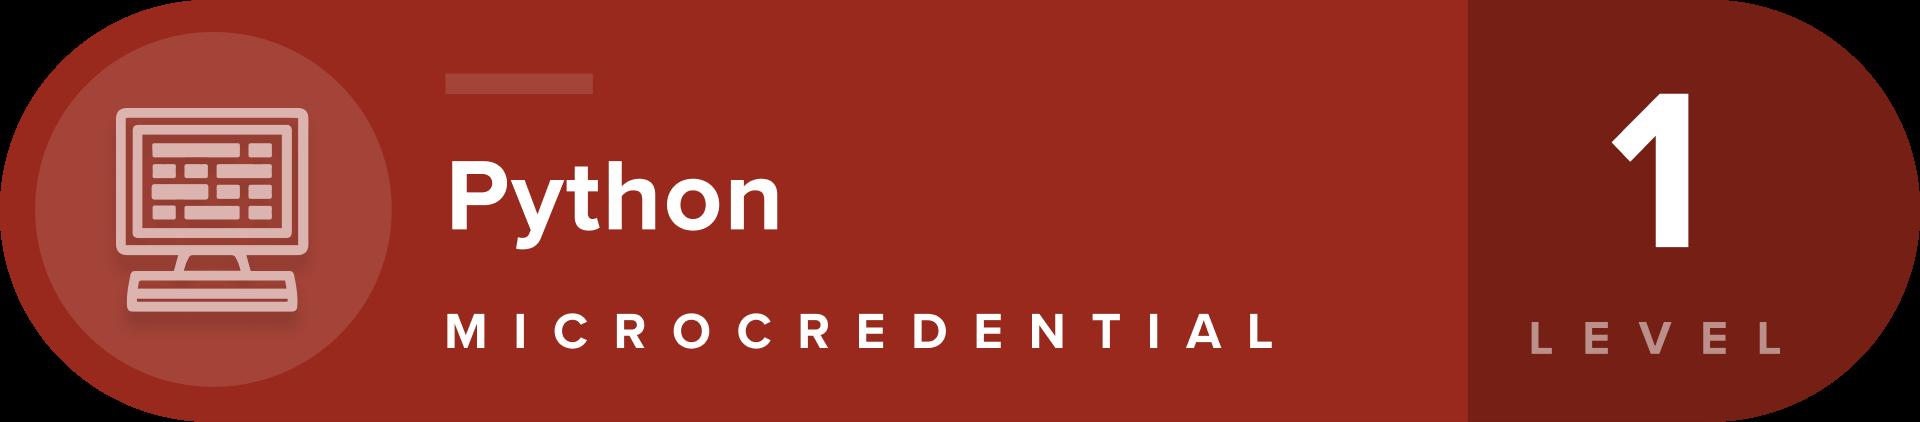 Python microcredentials level 1 badge